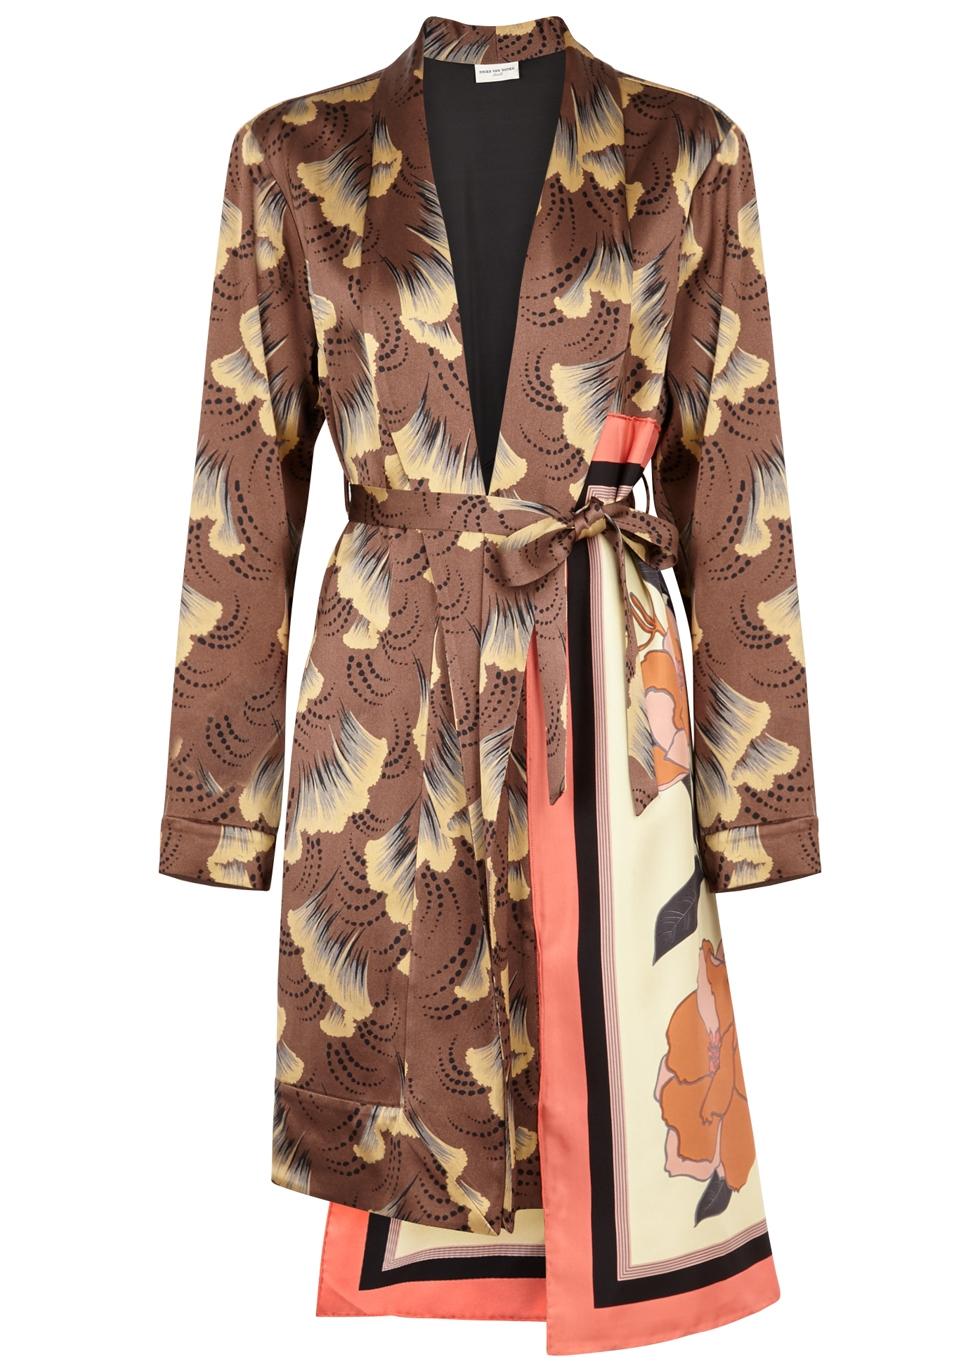 Racun printed satin kimono jacket Racun printed satin kimono jacket.  Runway. Dries Van Noten